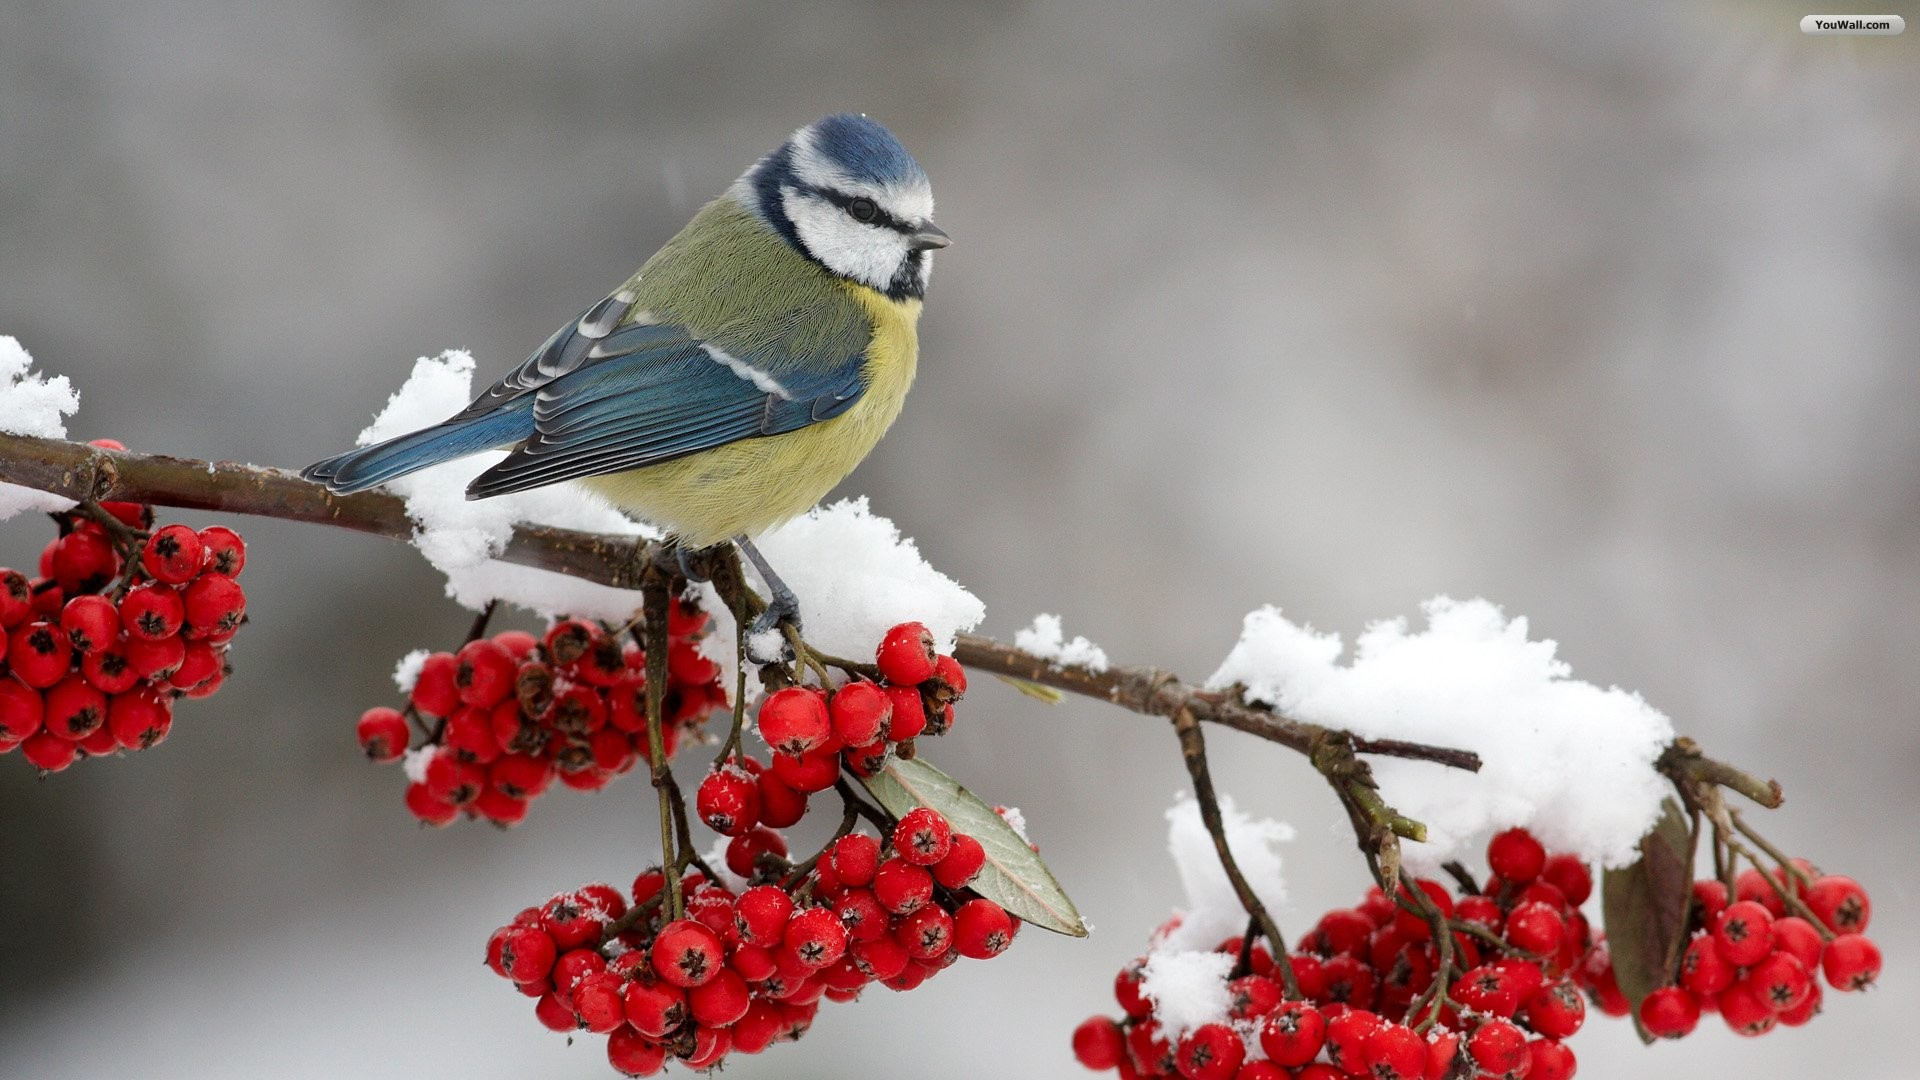 Photos of Winter birds to share on facebook | Ventube.com Birds In Winter  Screensavers